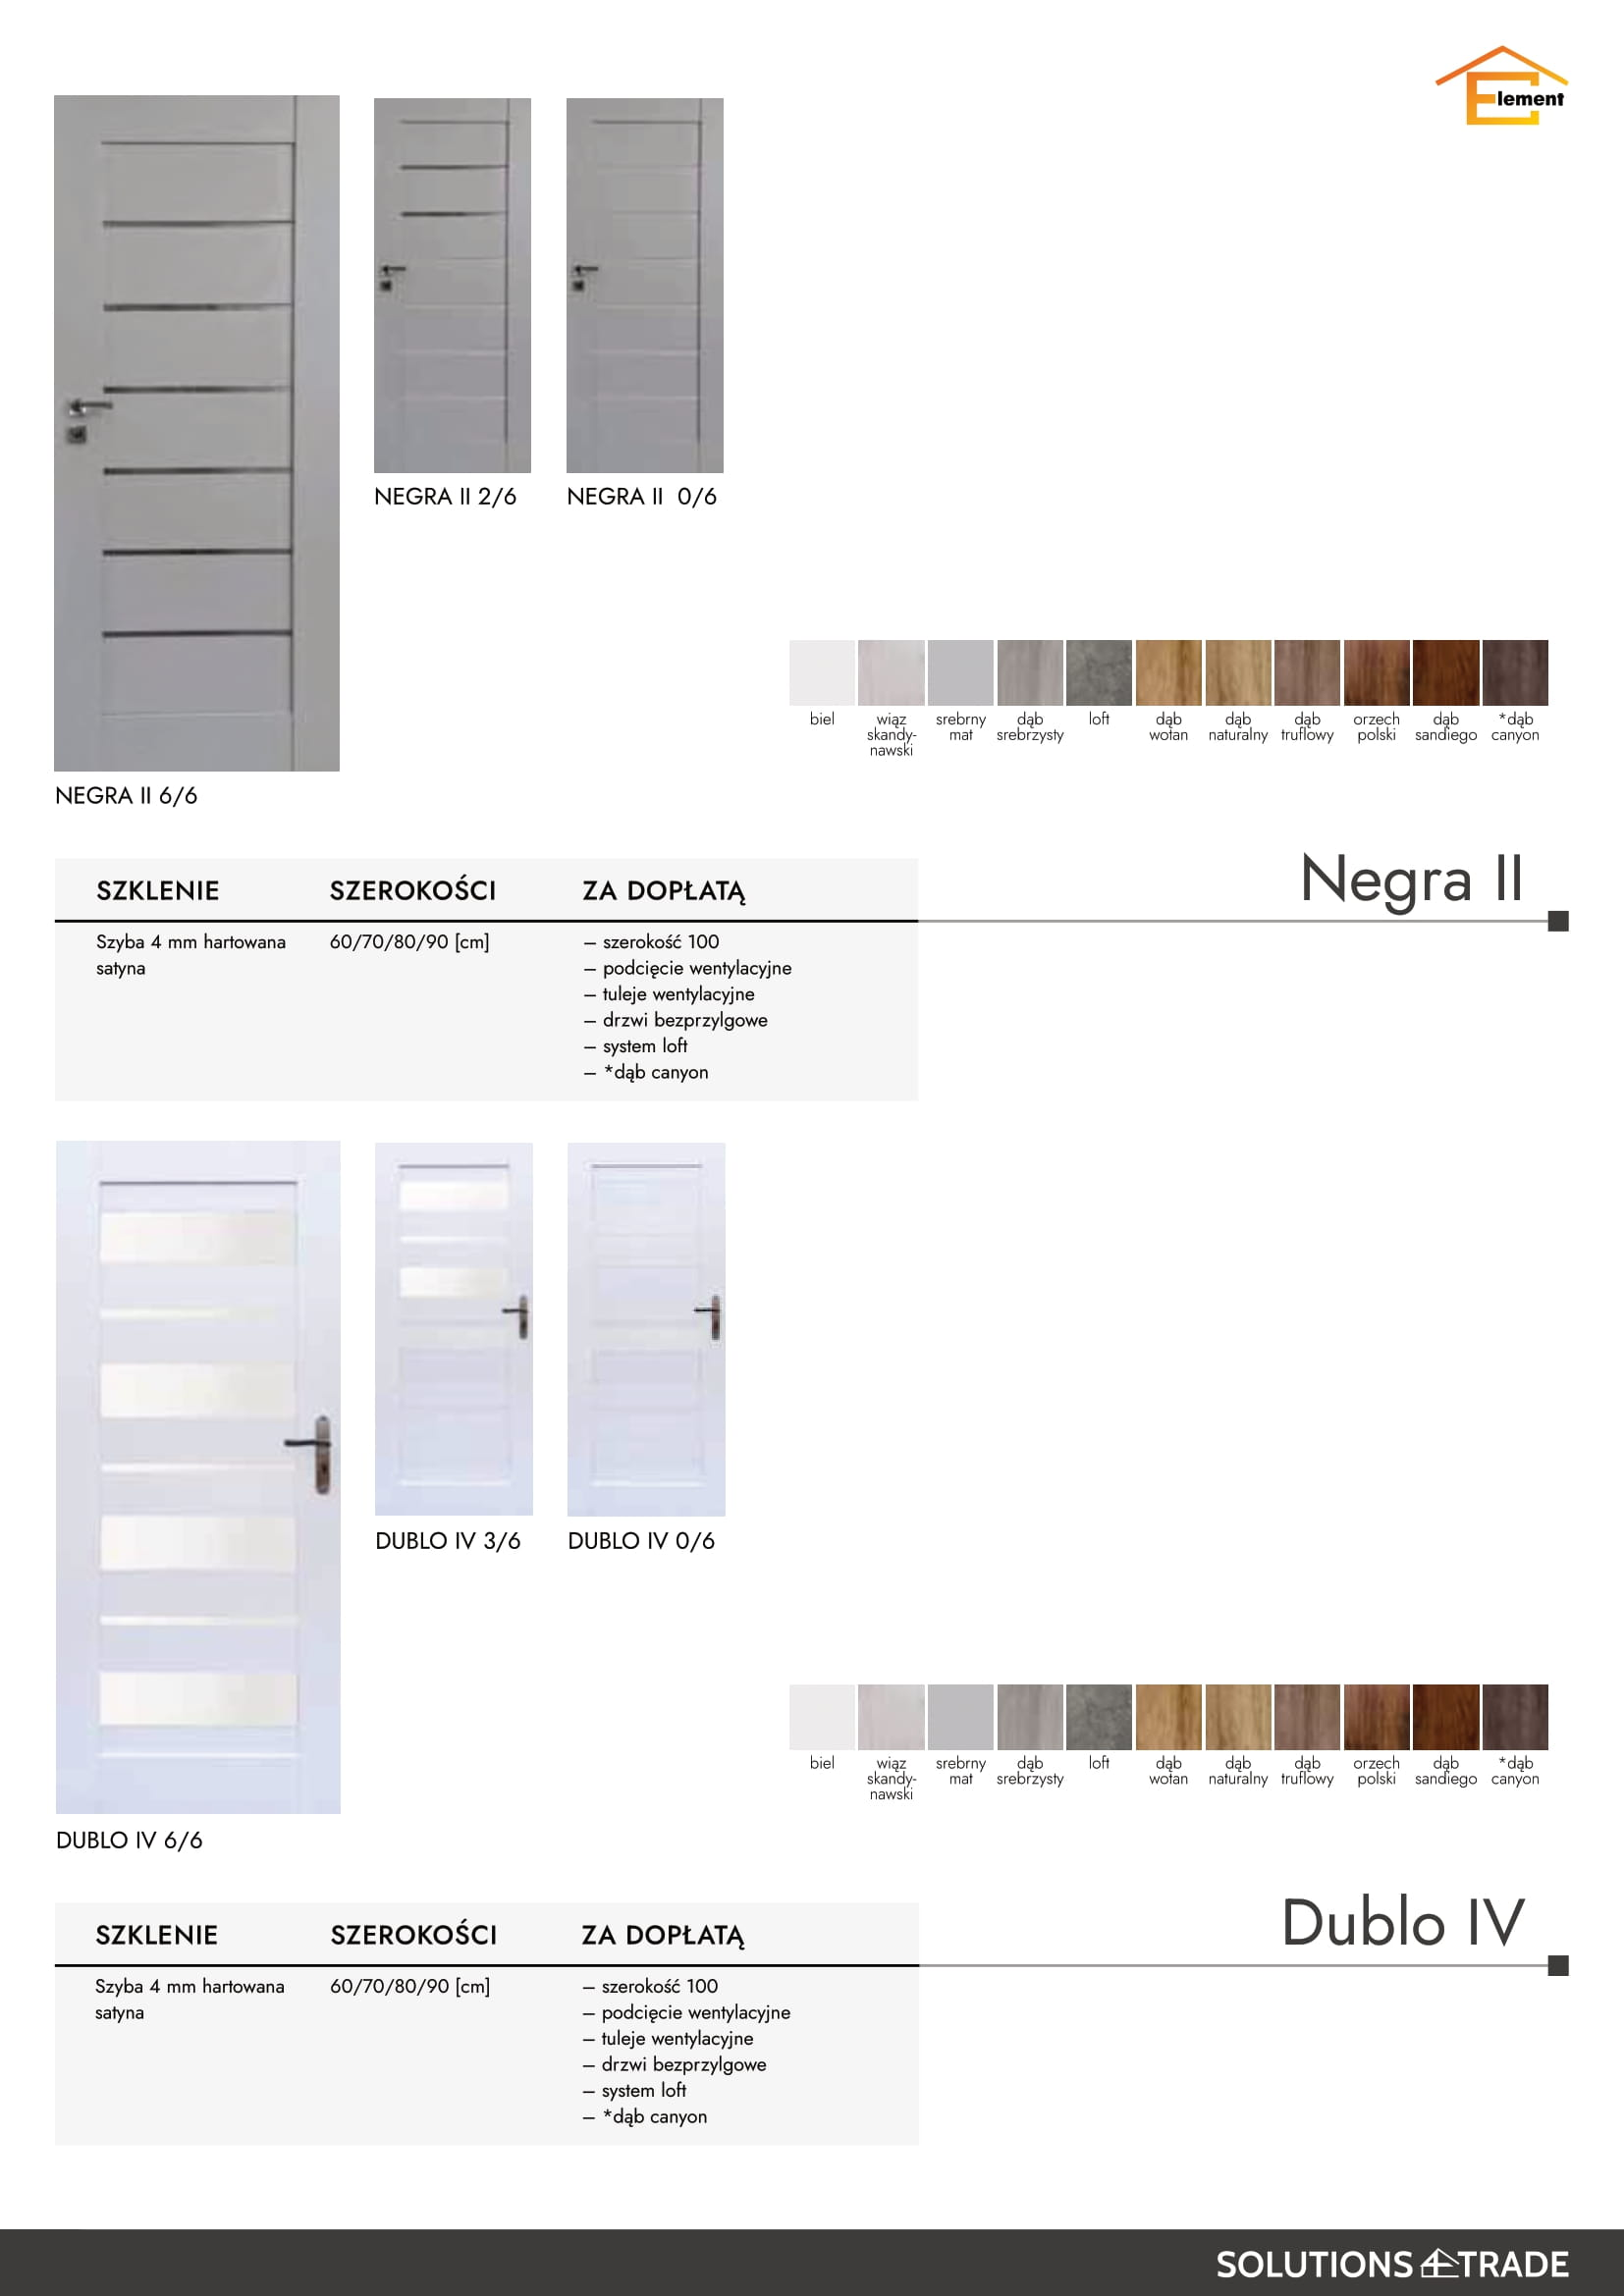 katalog Imperioline